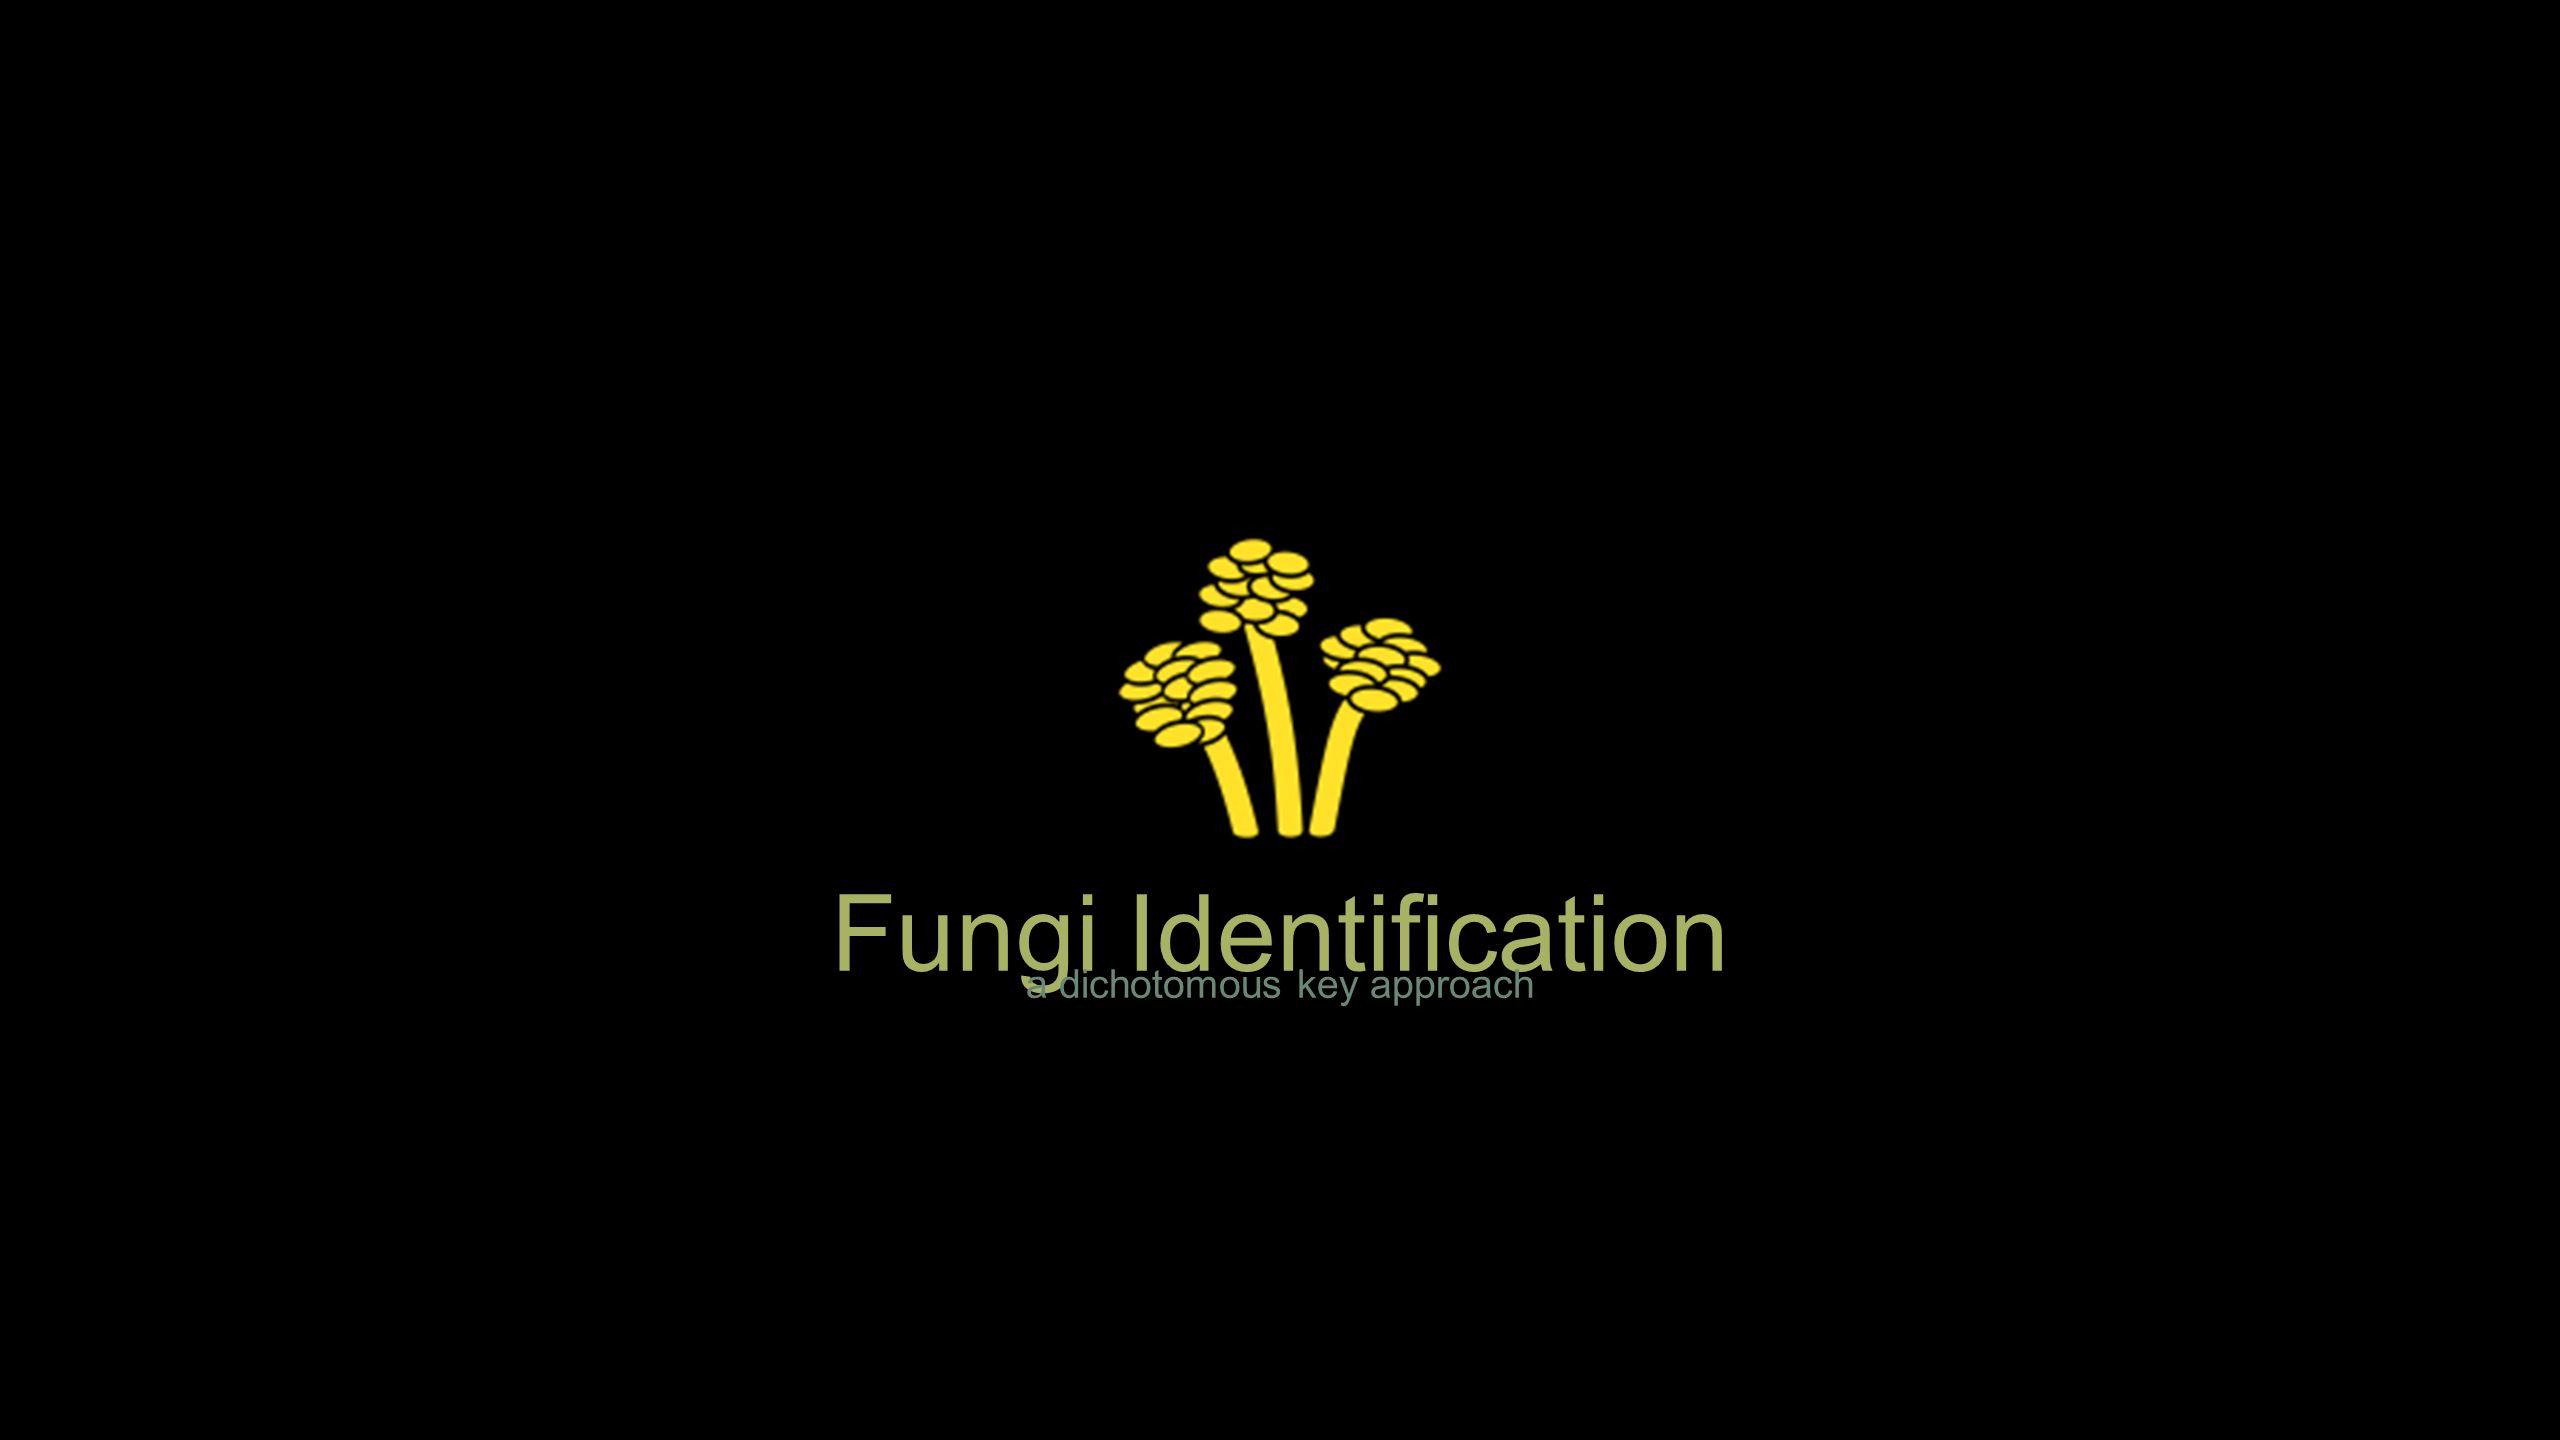 Fungi Identification a dichotomous key approach